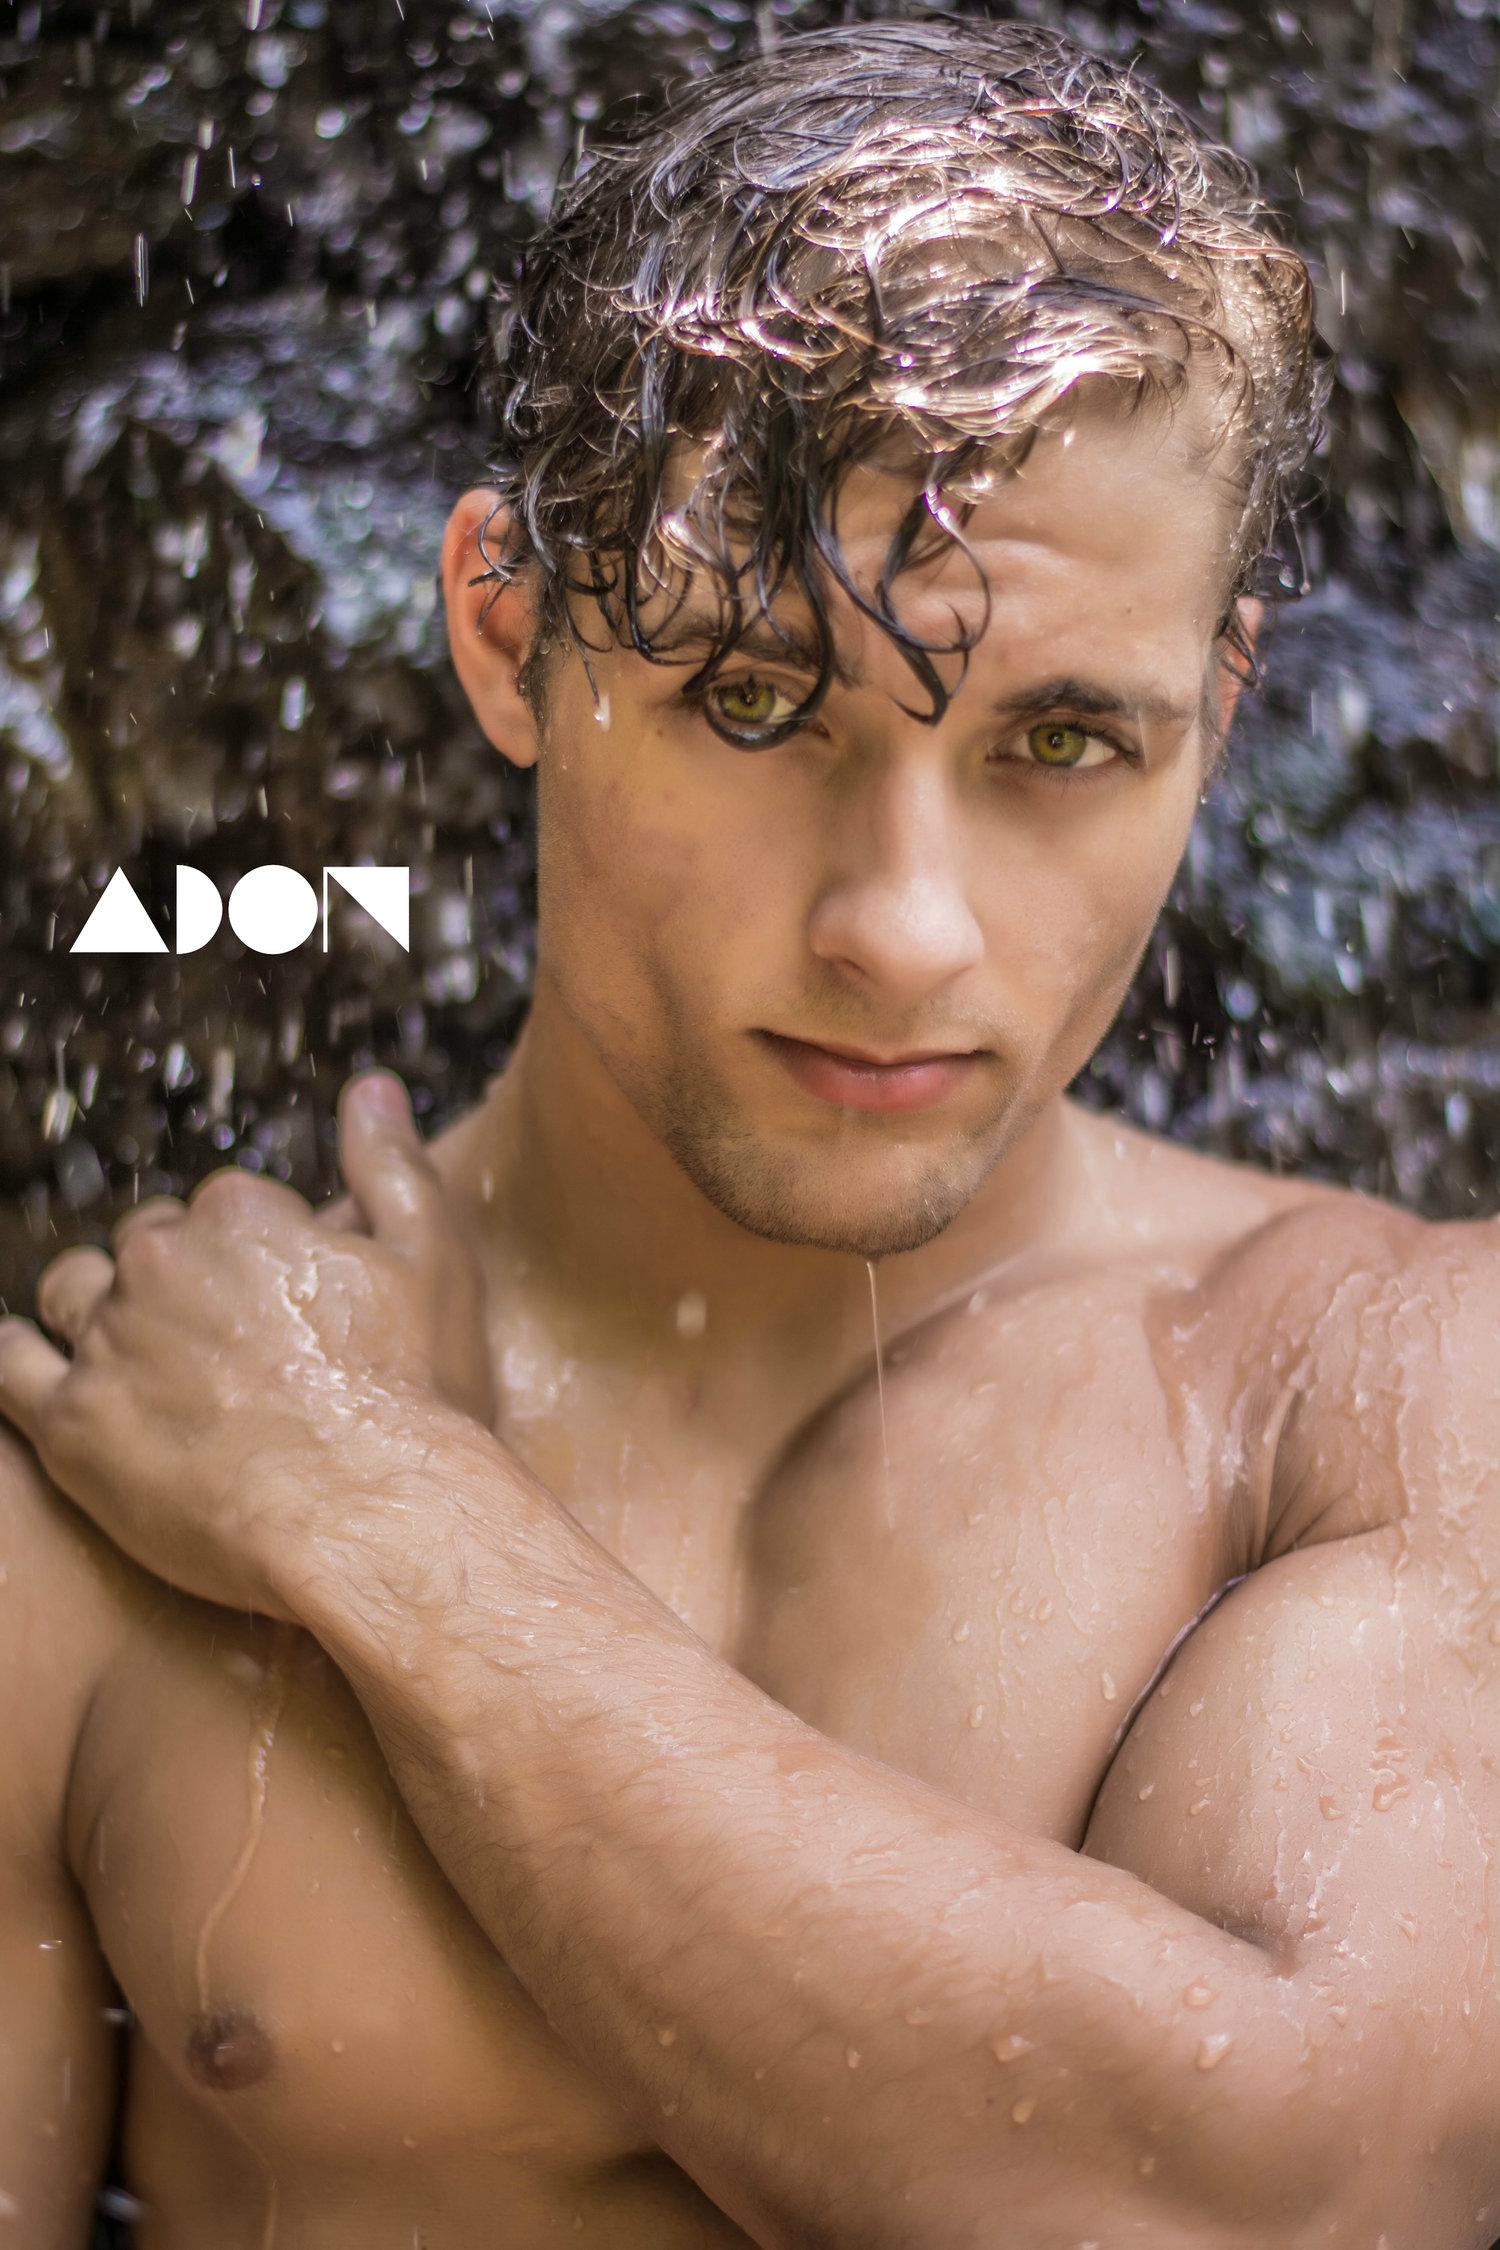 Adon Exclusive: Model Jordan Alexander By Nathan Scott